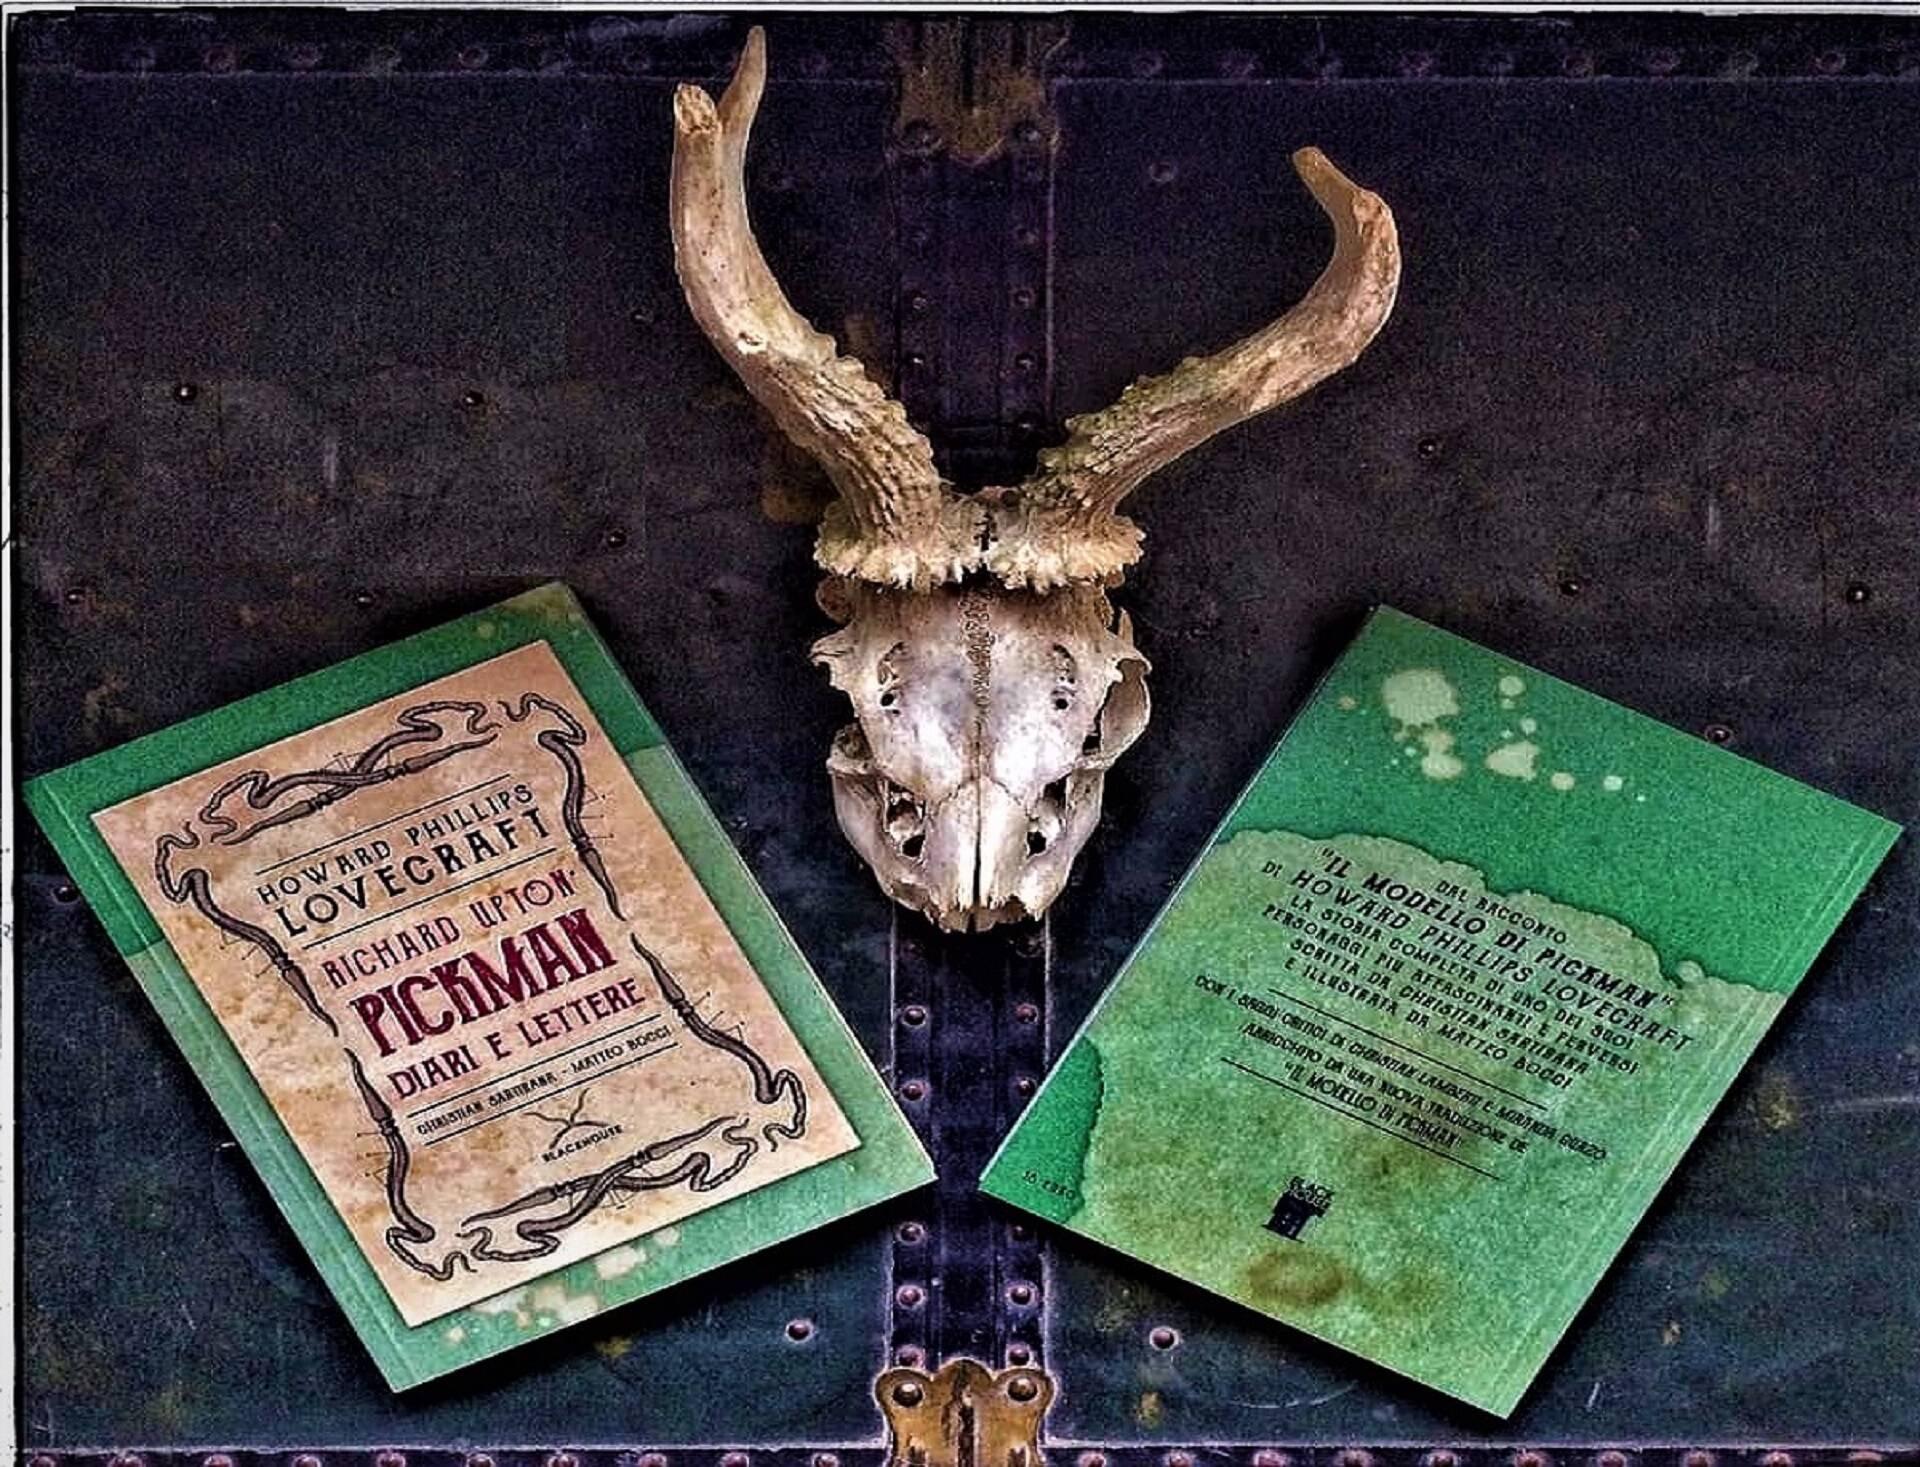 Richard Upton Pickman – Diari e Lettere